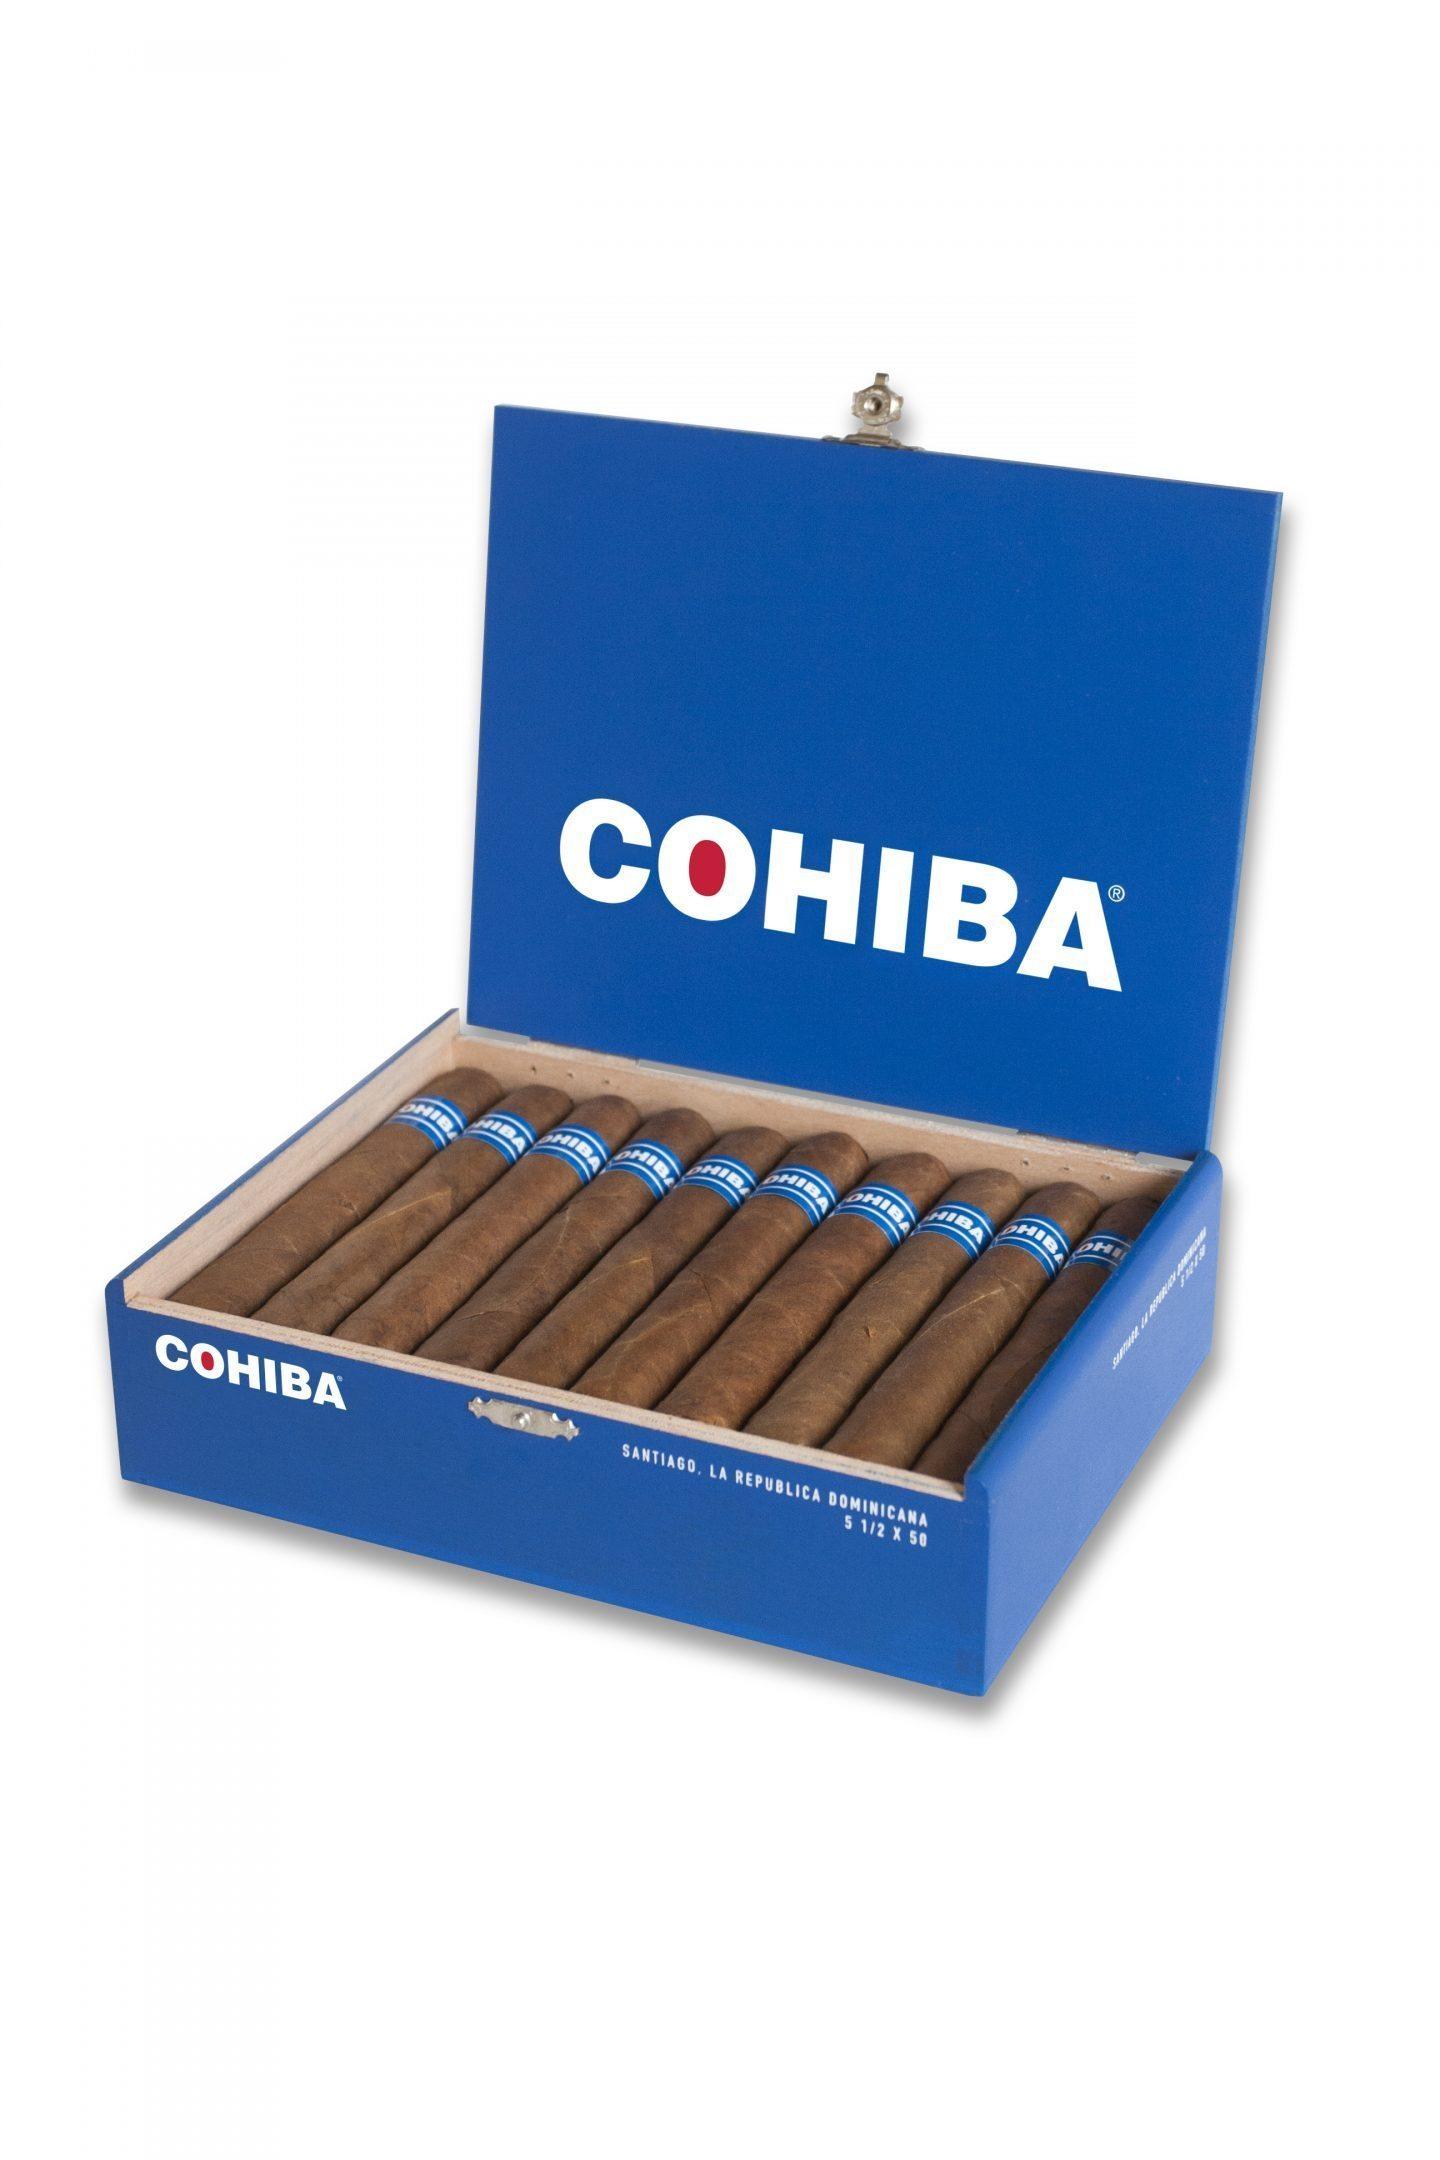 Cigar News: General Cigar Announces Cohiba Blue